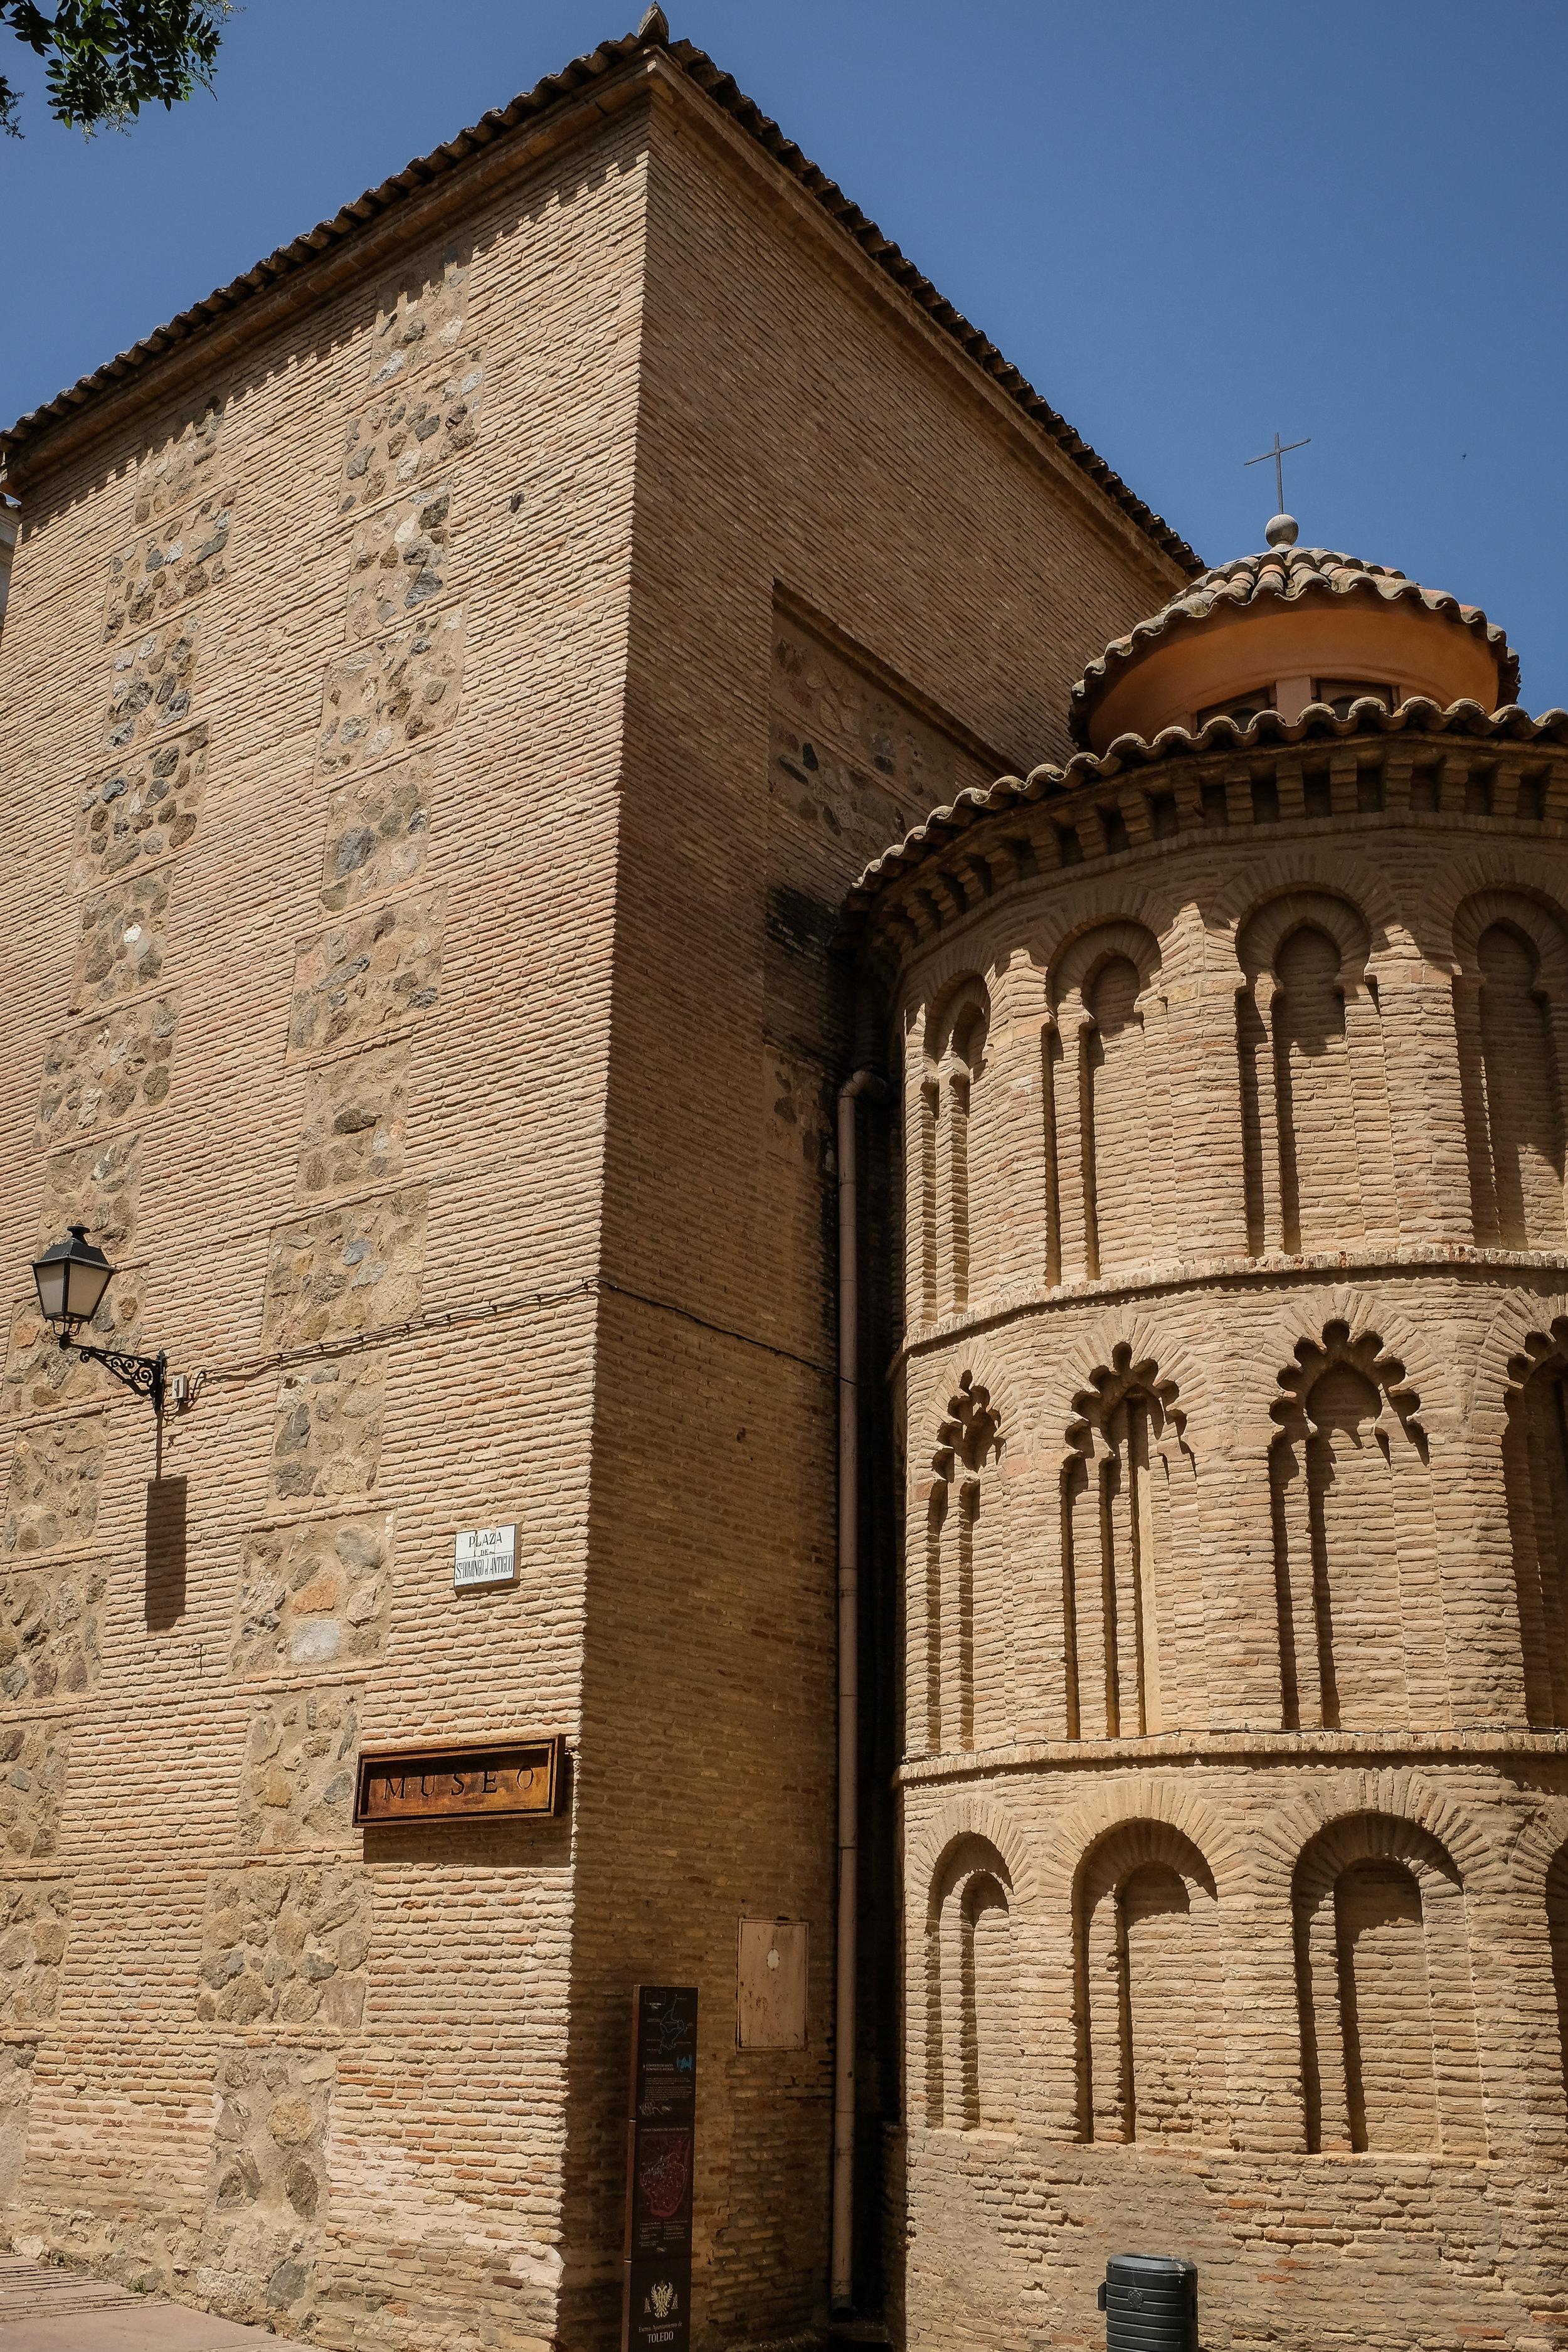 looks like the Roman buildings of Trier, Germany